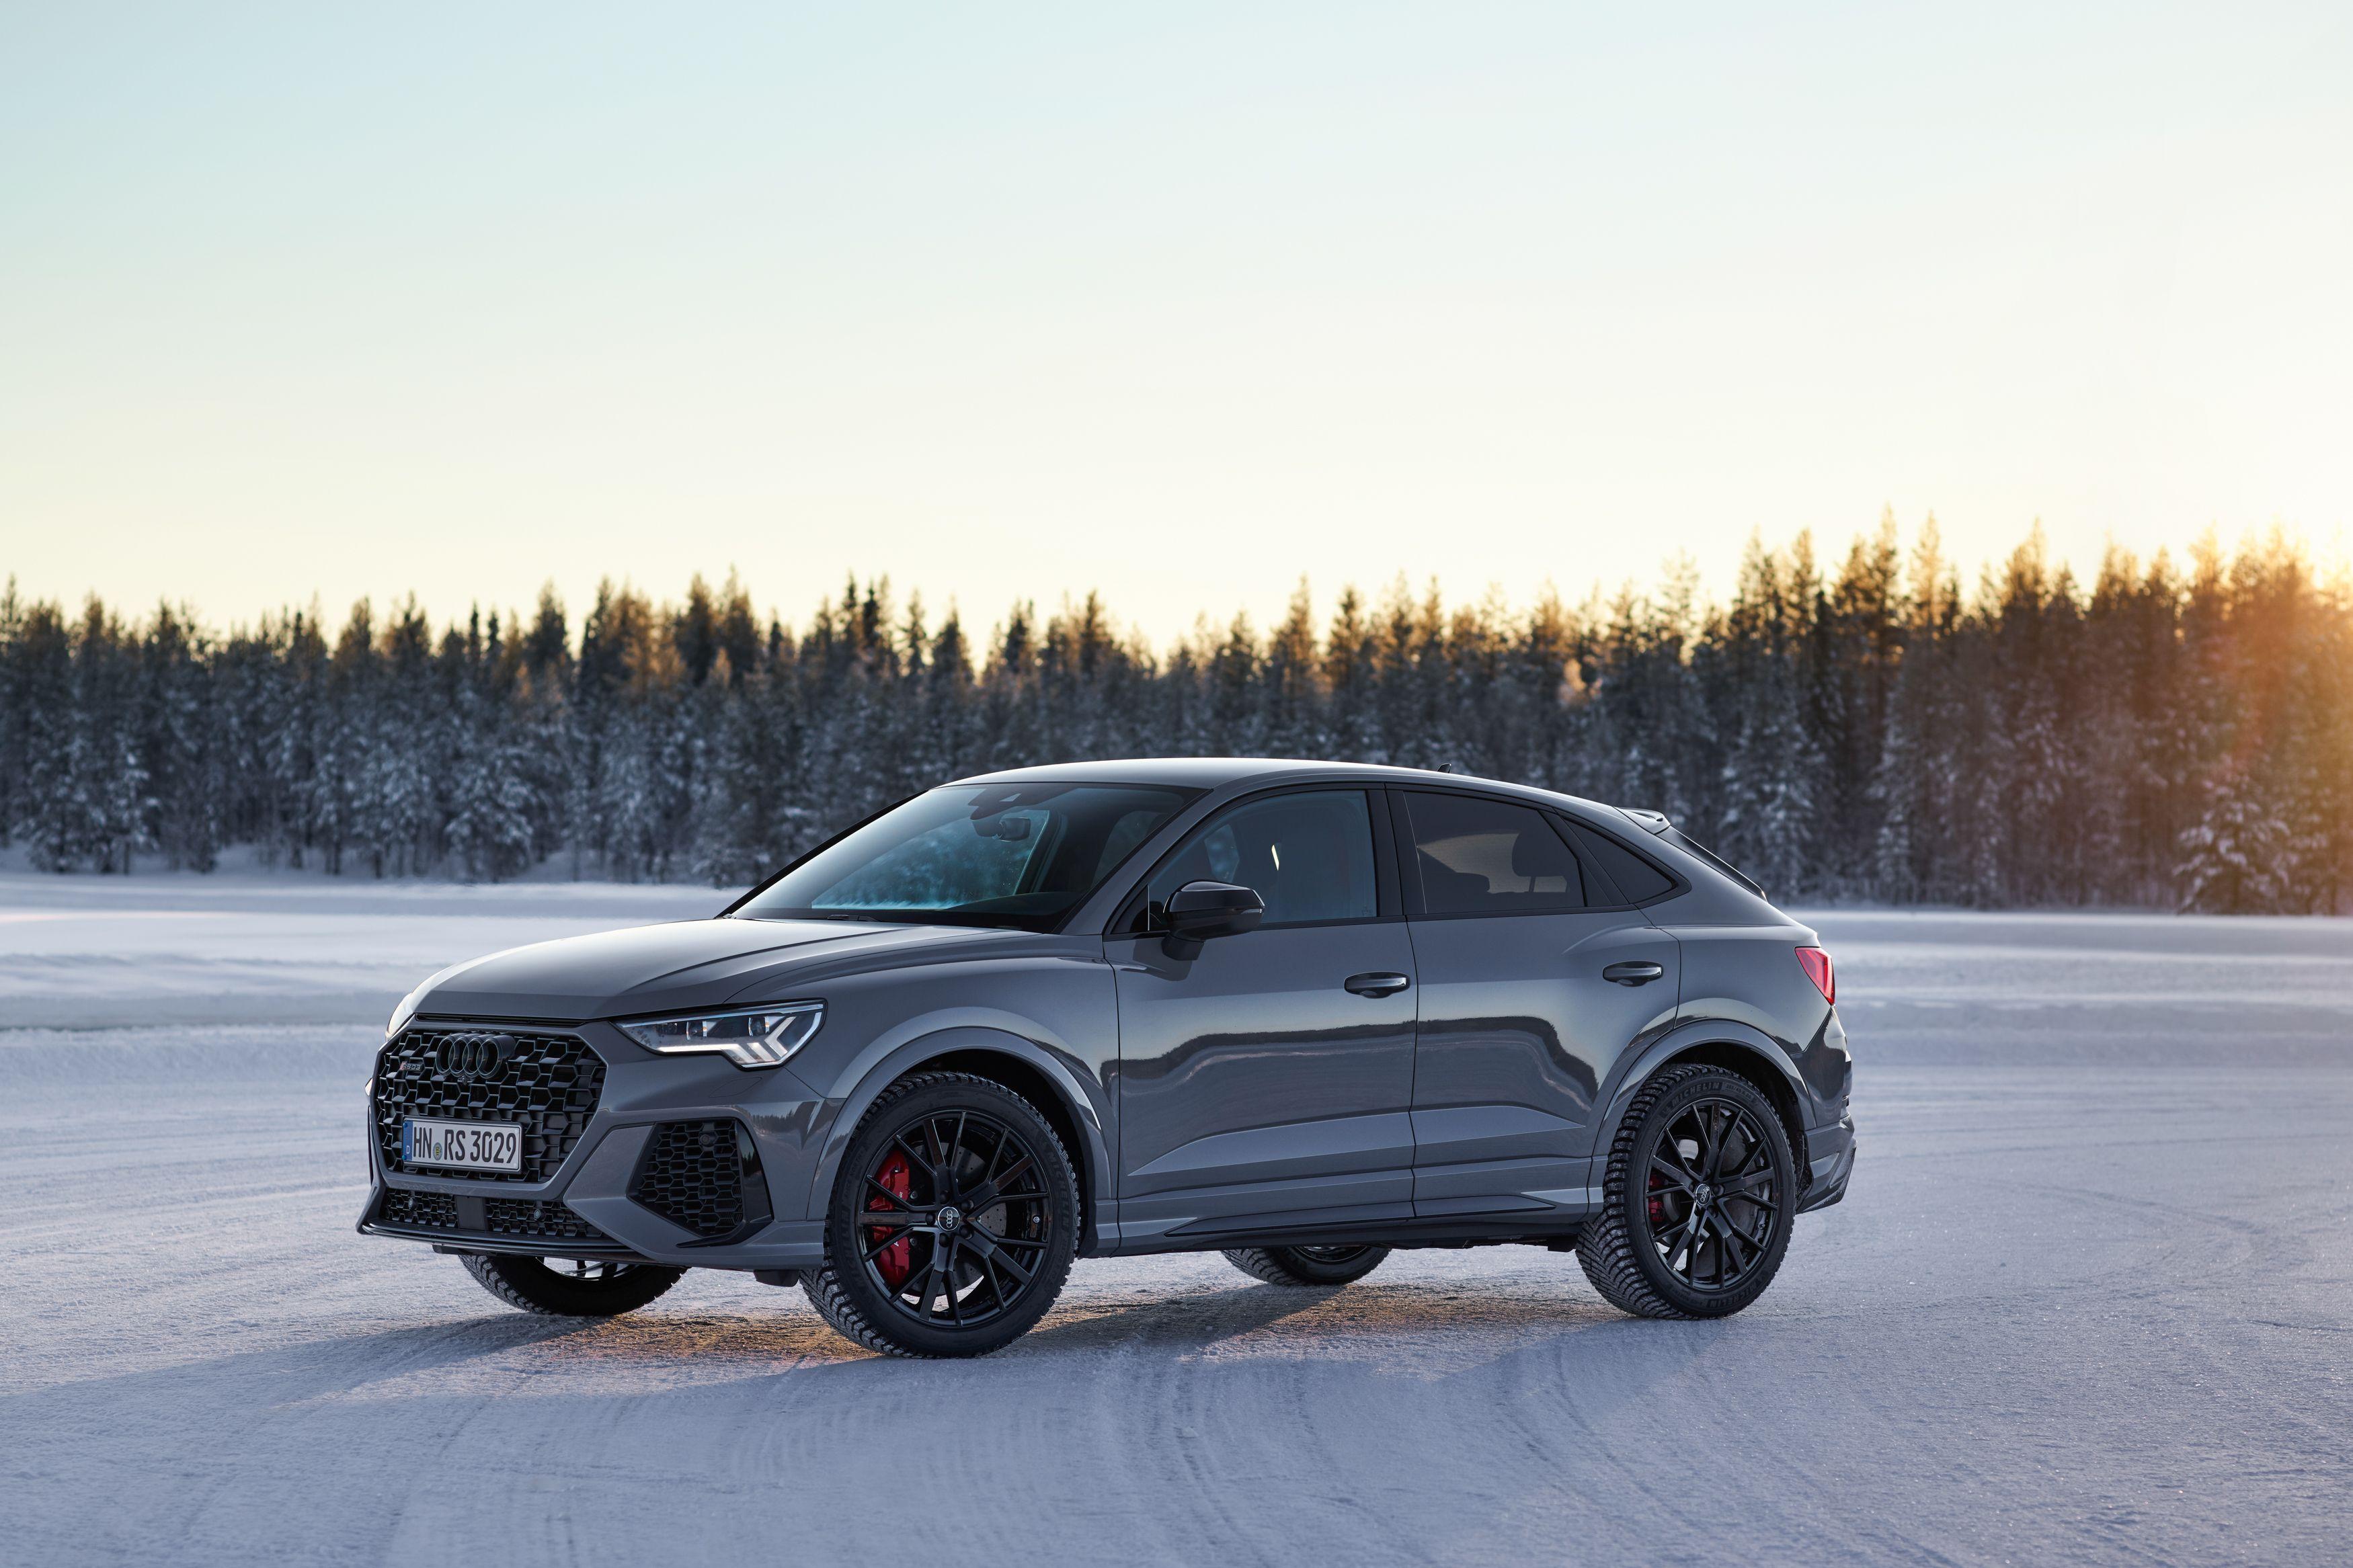 Kelebihan Kekurangan Audi Rs Q3 Top Model Tahun Ini